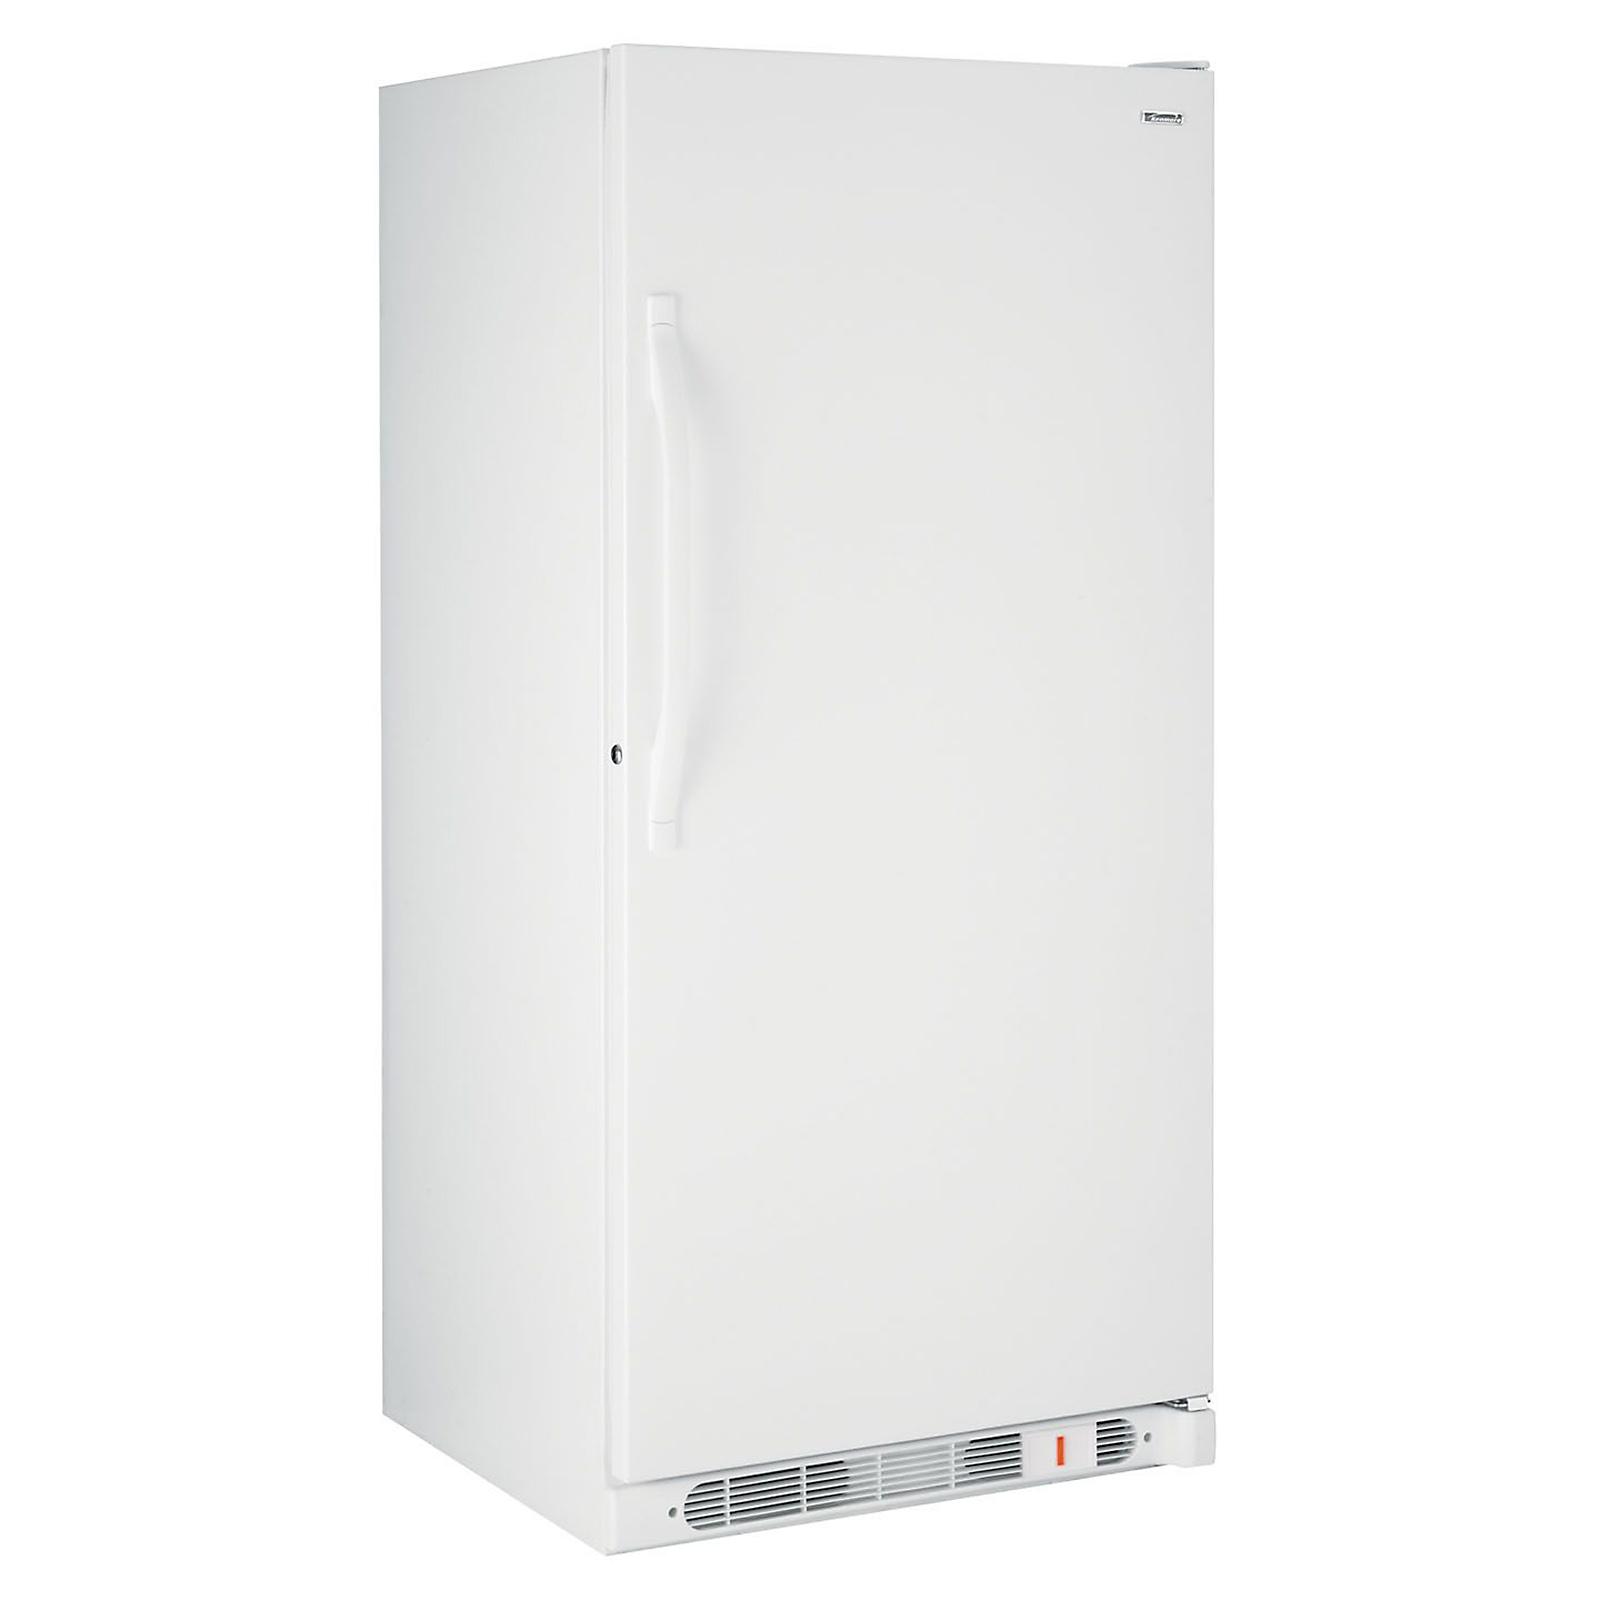 Kenmore 20.6 cu. ft. Upright Freezer